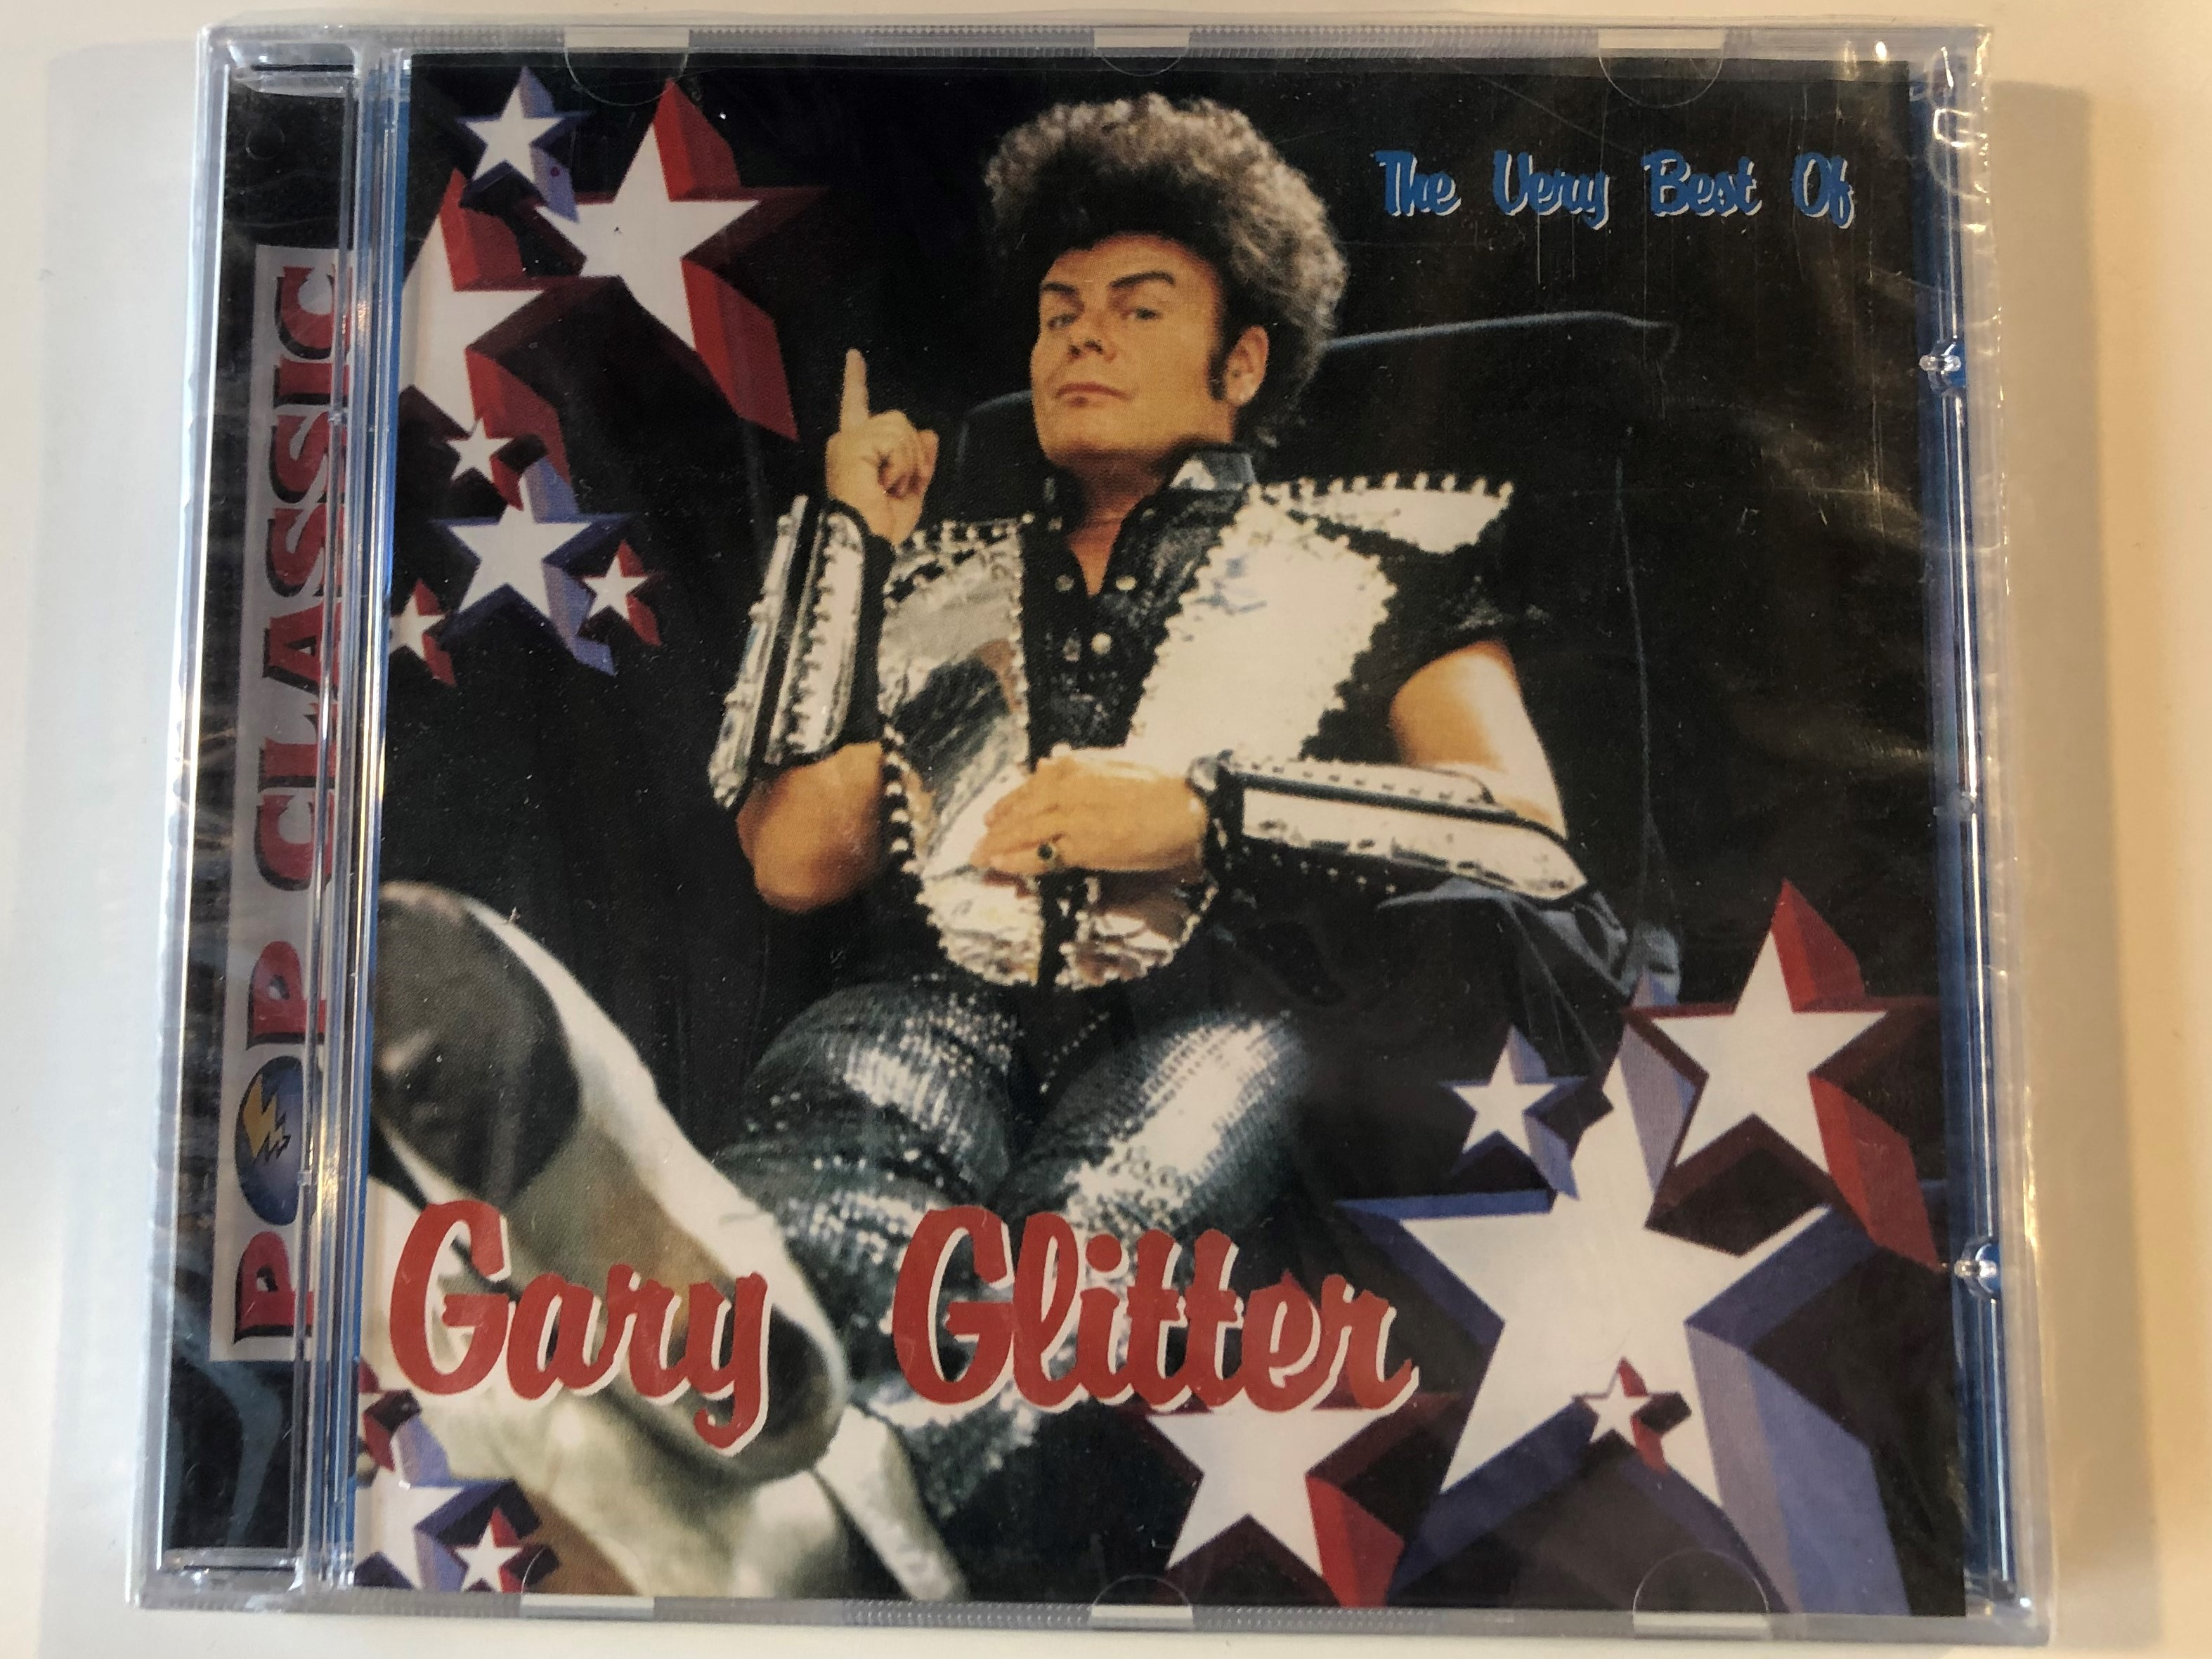 the-very-best-of-gary-glitter-pop-classic-audio-cd-5998490701123-1-.jpg